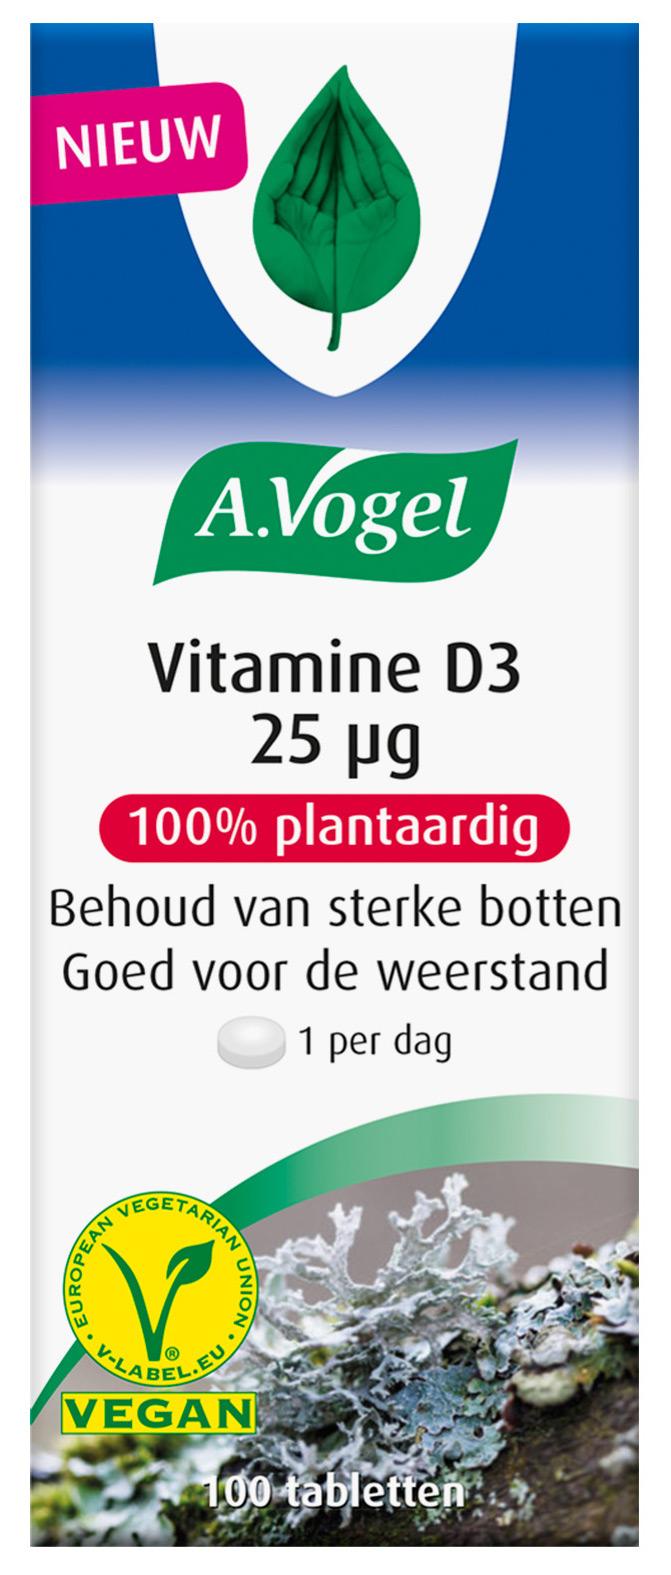 A.Vogel Vitamine D3 25 ?g Tabletten kopen